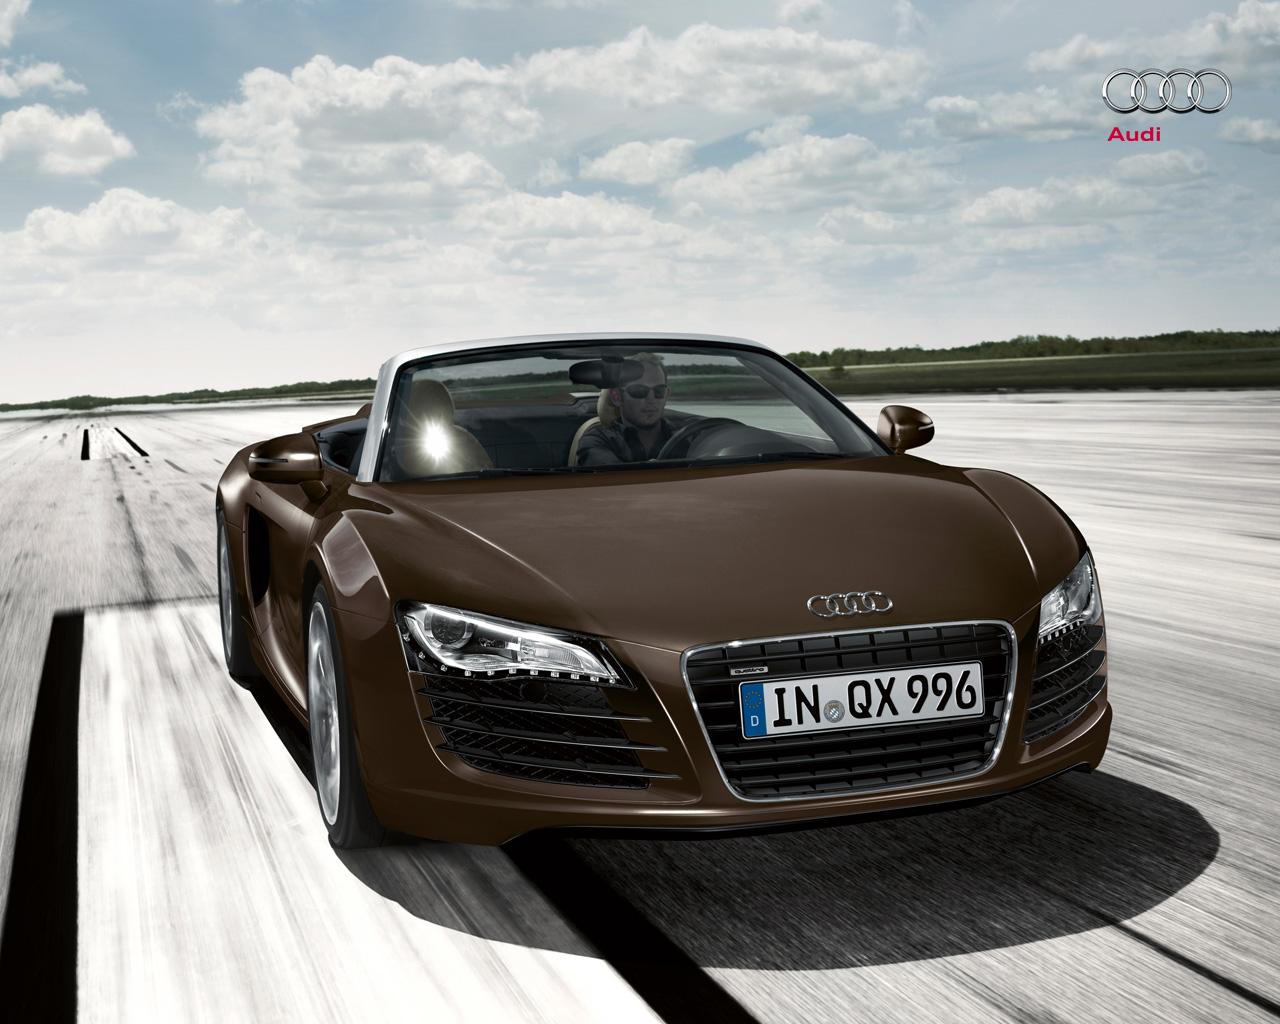 http://1.bp.blogspot.com/_SM9A_sqVGgM/THLqDfTLacI/AAAAAAAAFgU/Mvfex7SZUyU/s1600/Audi+R8+V8+Spyder+5.jpg